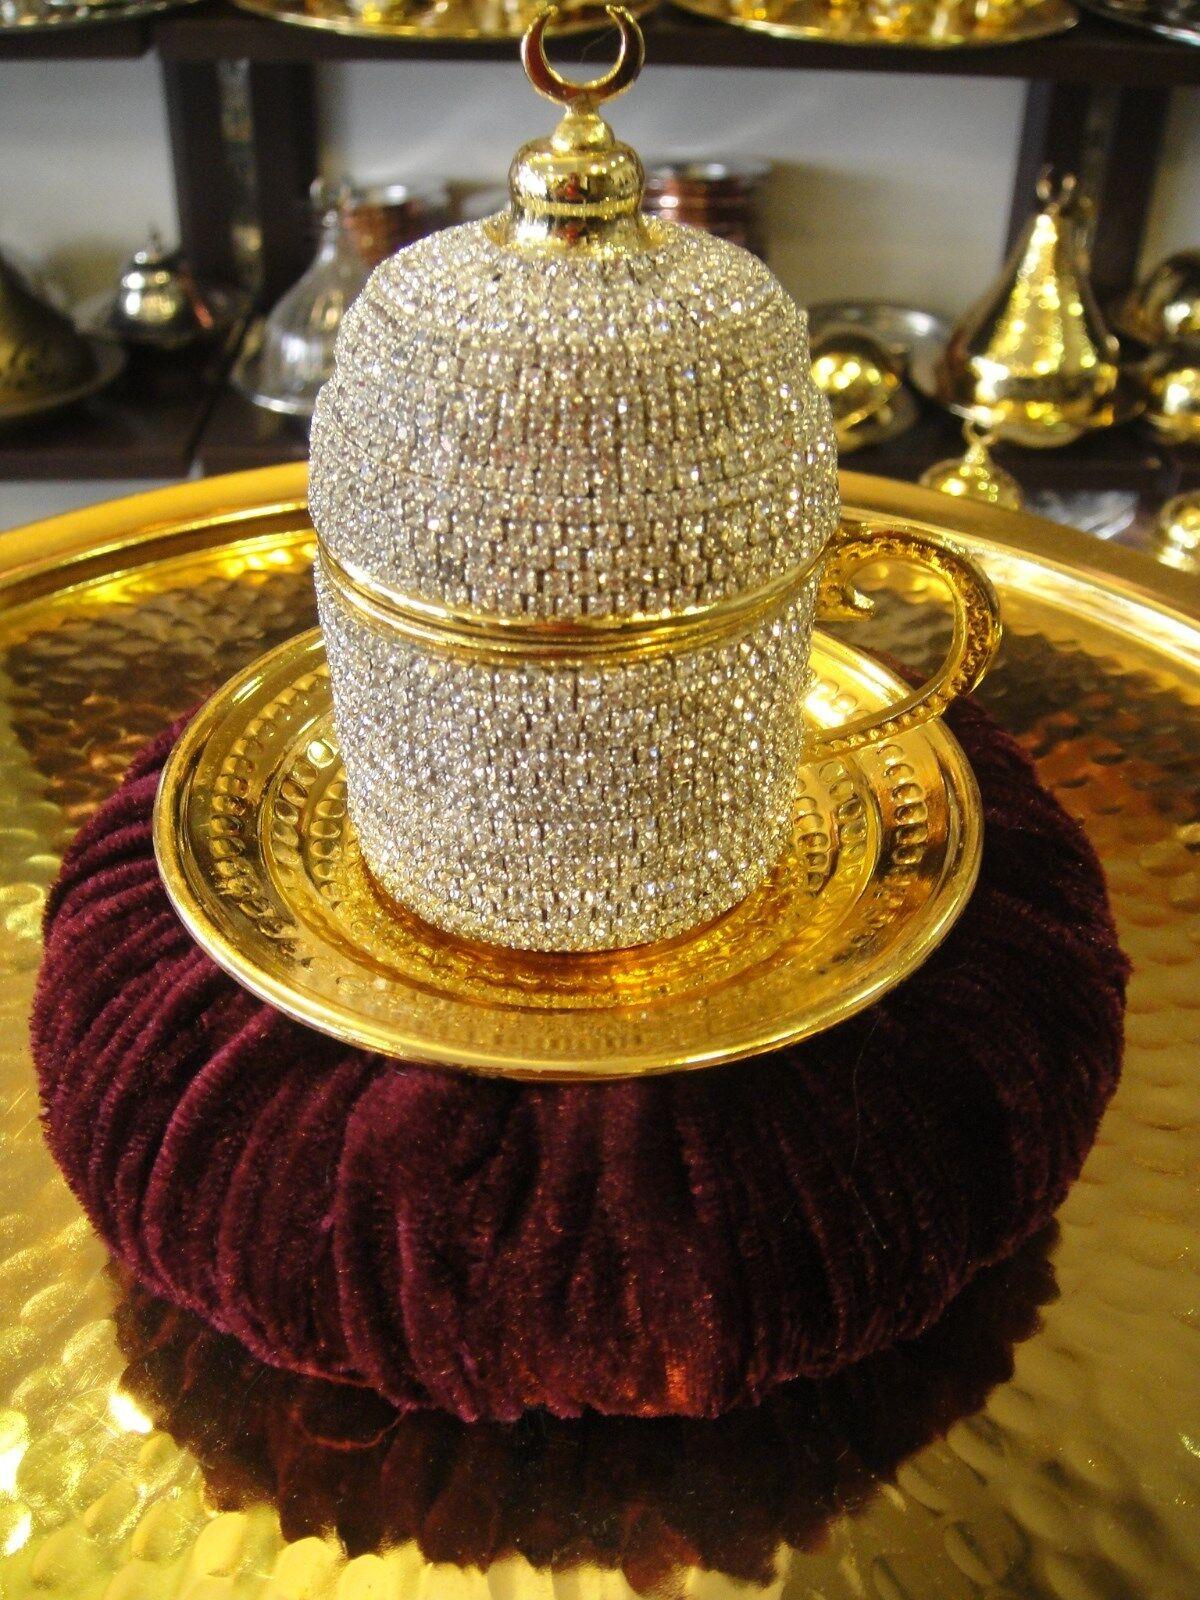 Handmade Copper Turkish Coffee Espresso Cup Saucer Swarovski type Crystal Coated